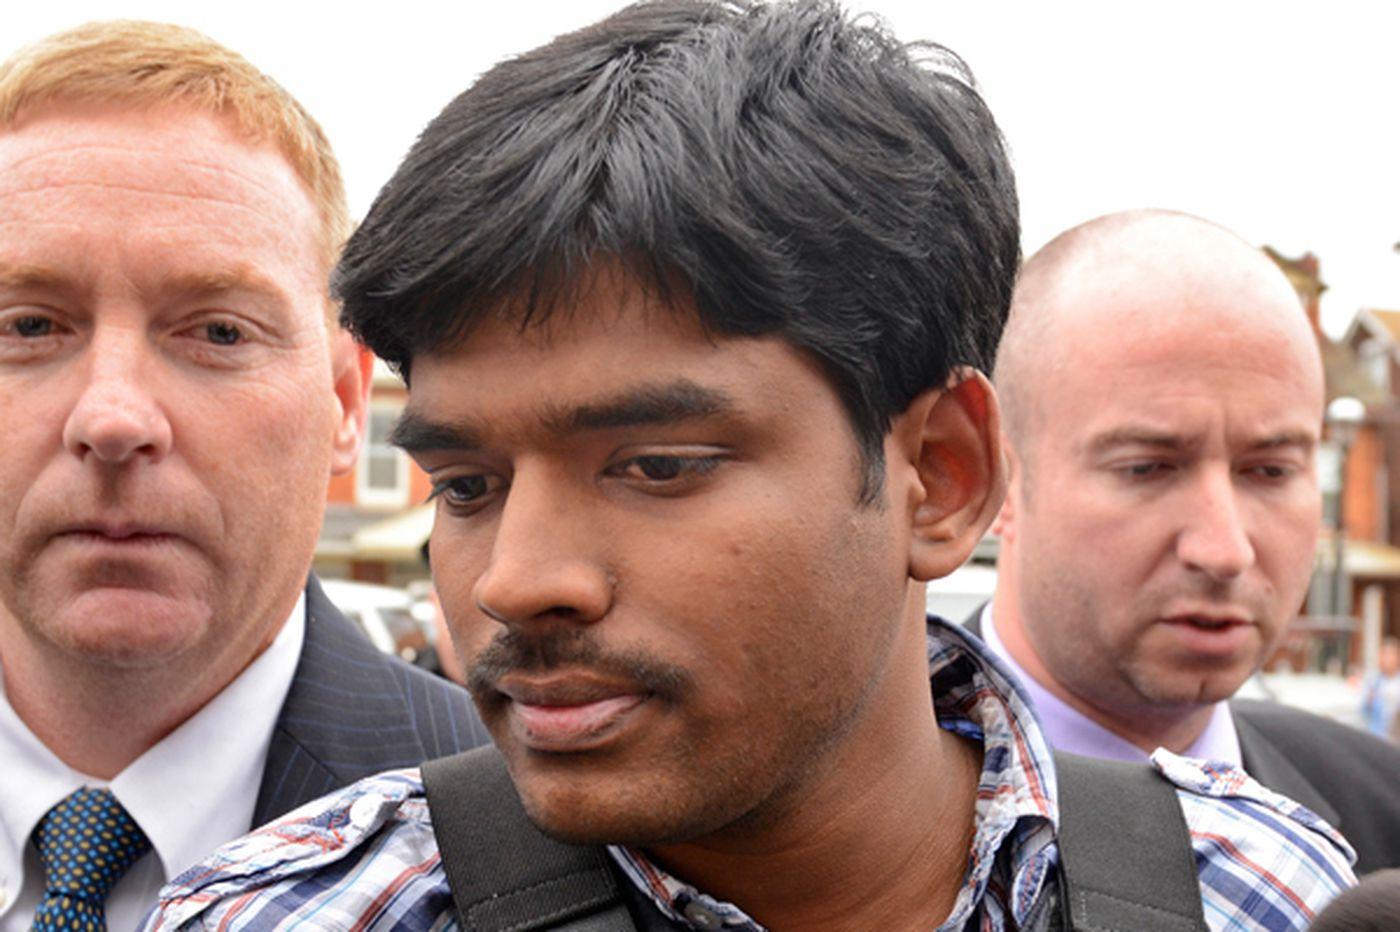 Wife of accused killer contradicted his alibi